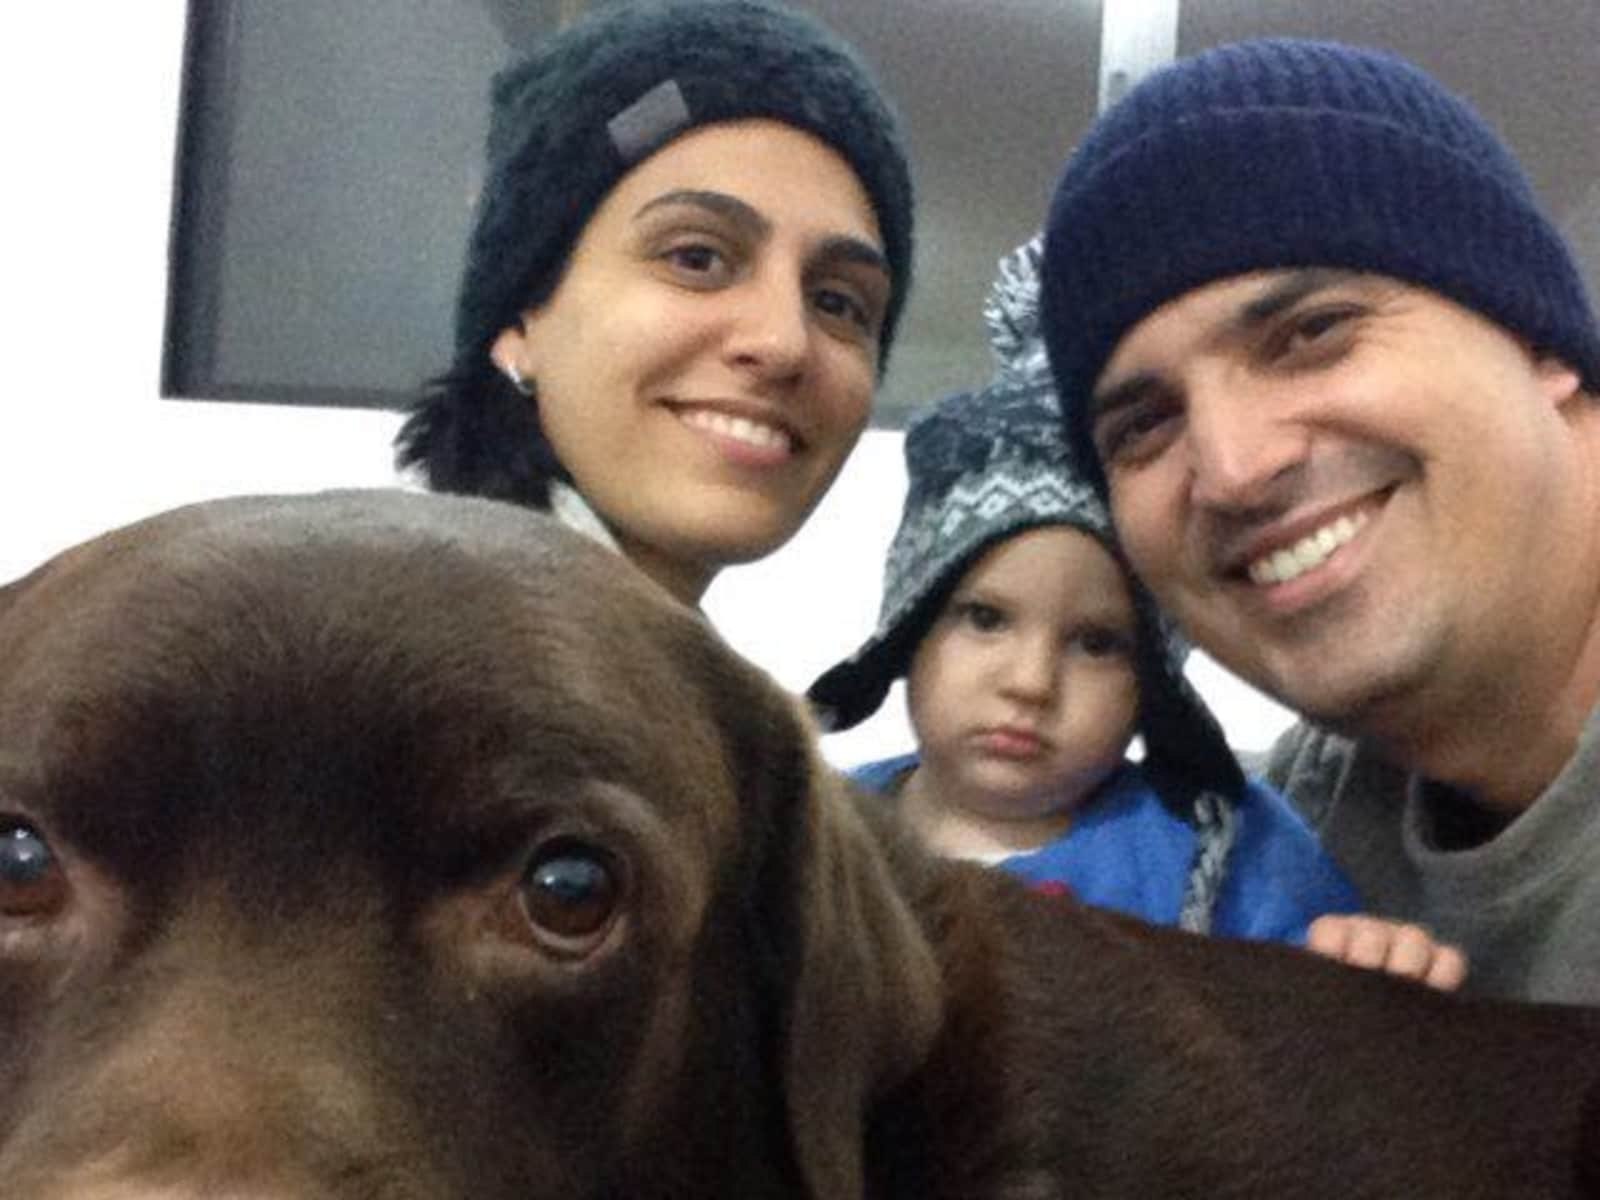 Alexis & Amanda from Curitiba, Brazil